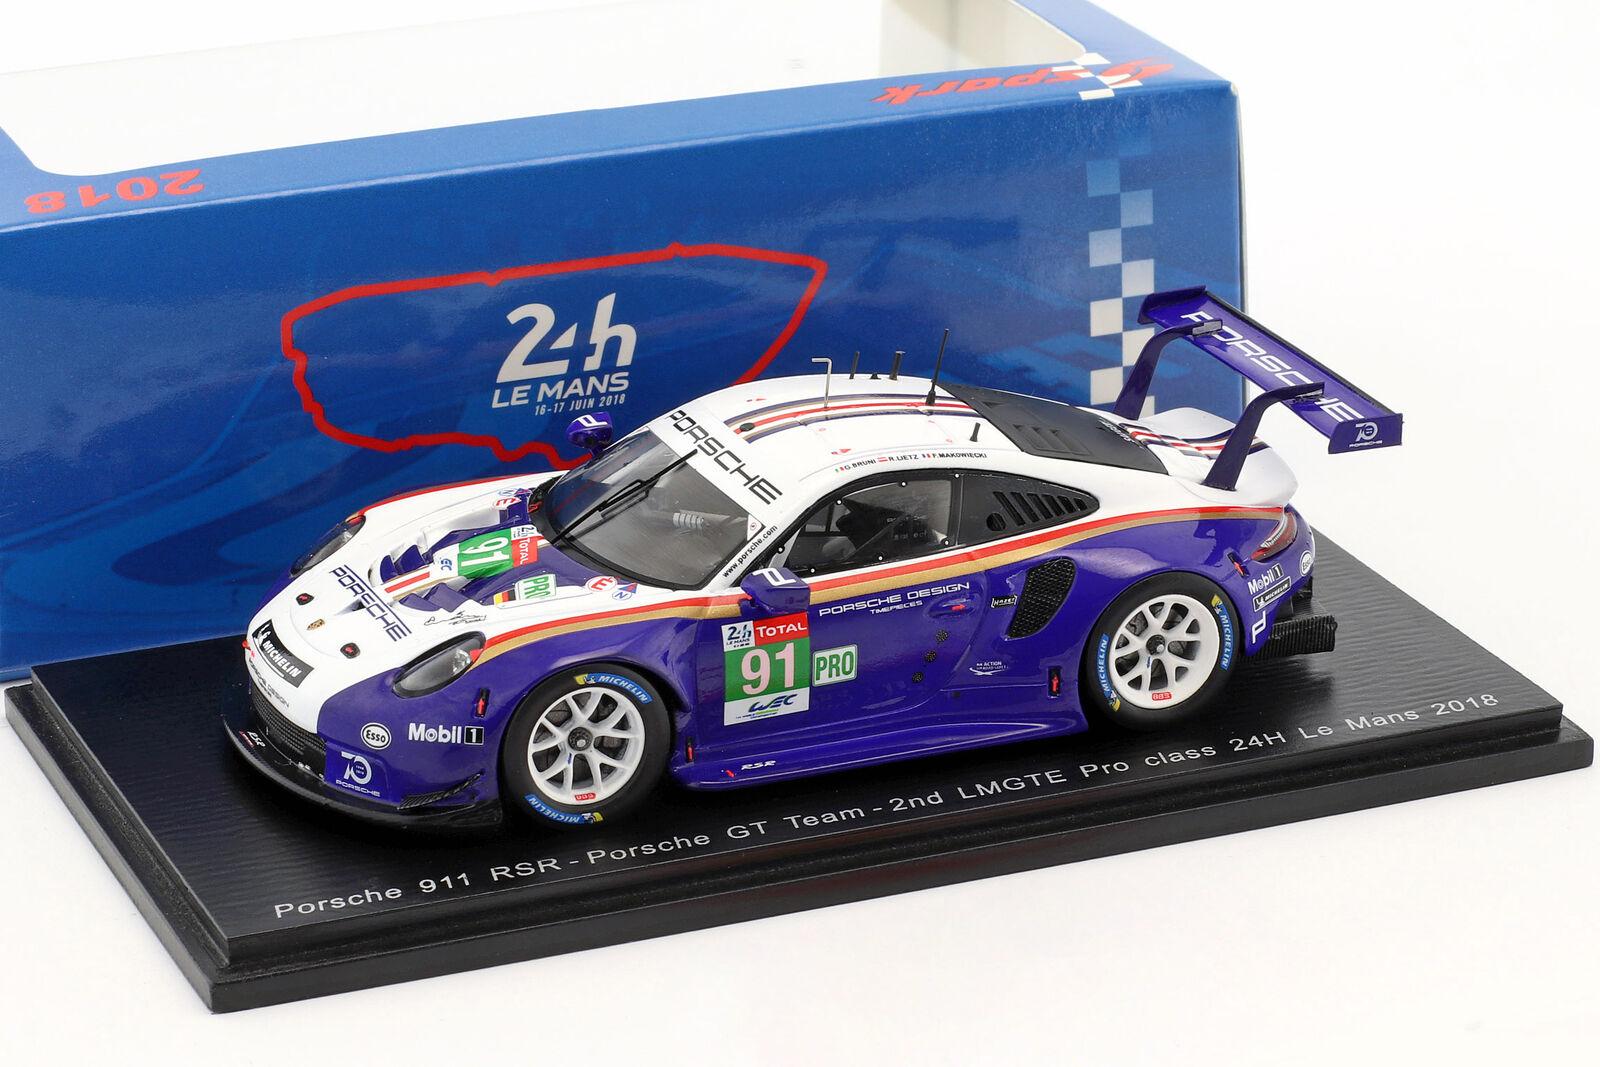 Porsche 911 (991) GT3 RSR   91 2nd LMGTE PRO CLASS 24h LEhommeS 2018 1 43 Spark  100% garantie d'ajustement